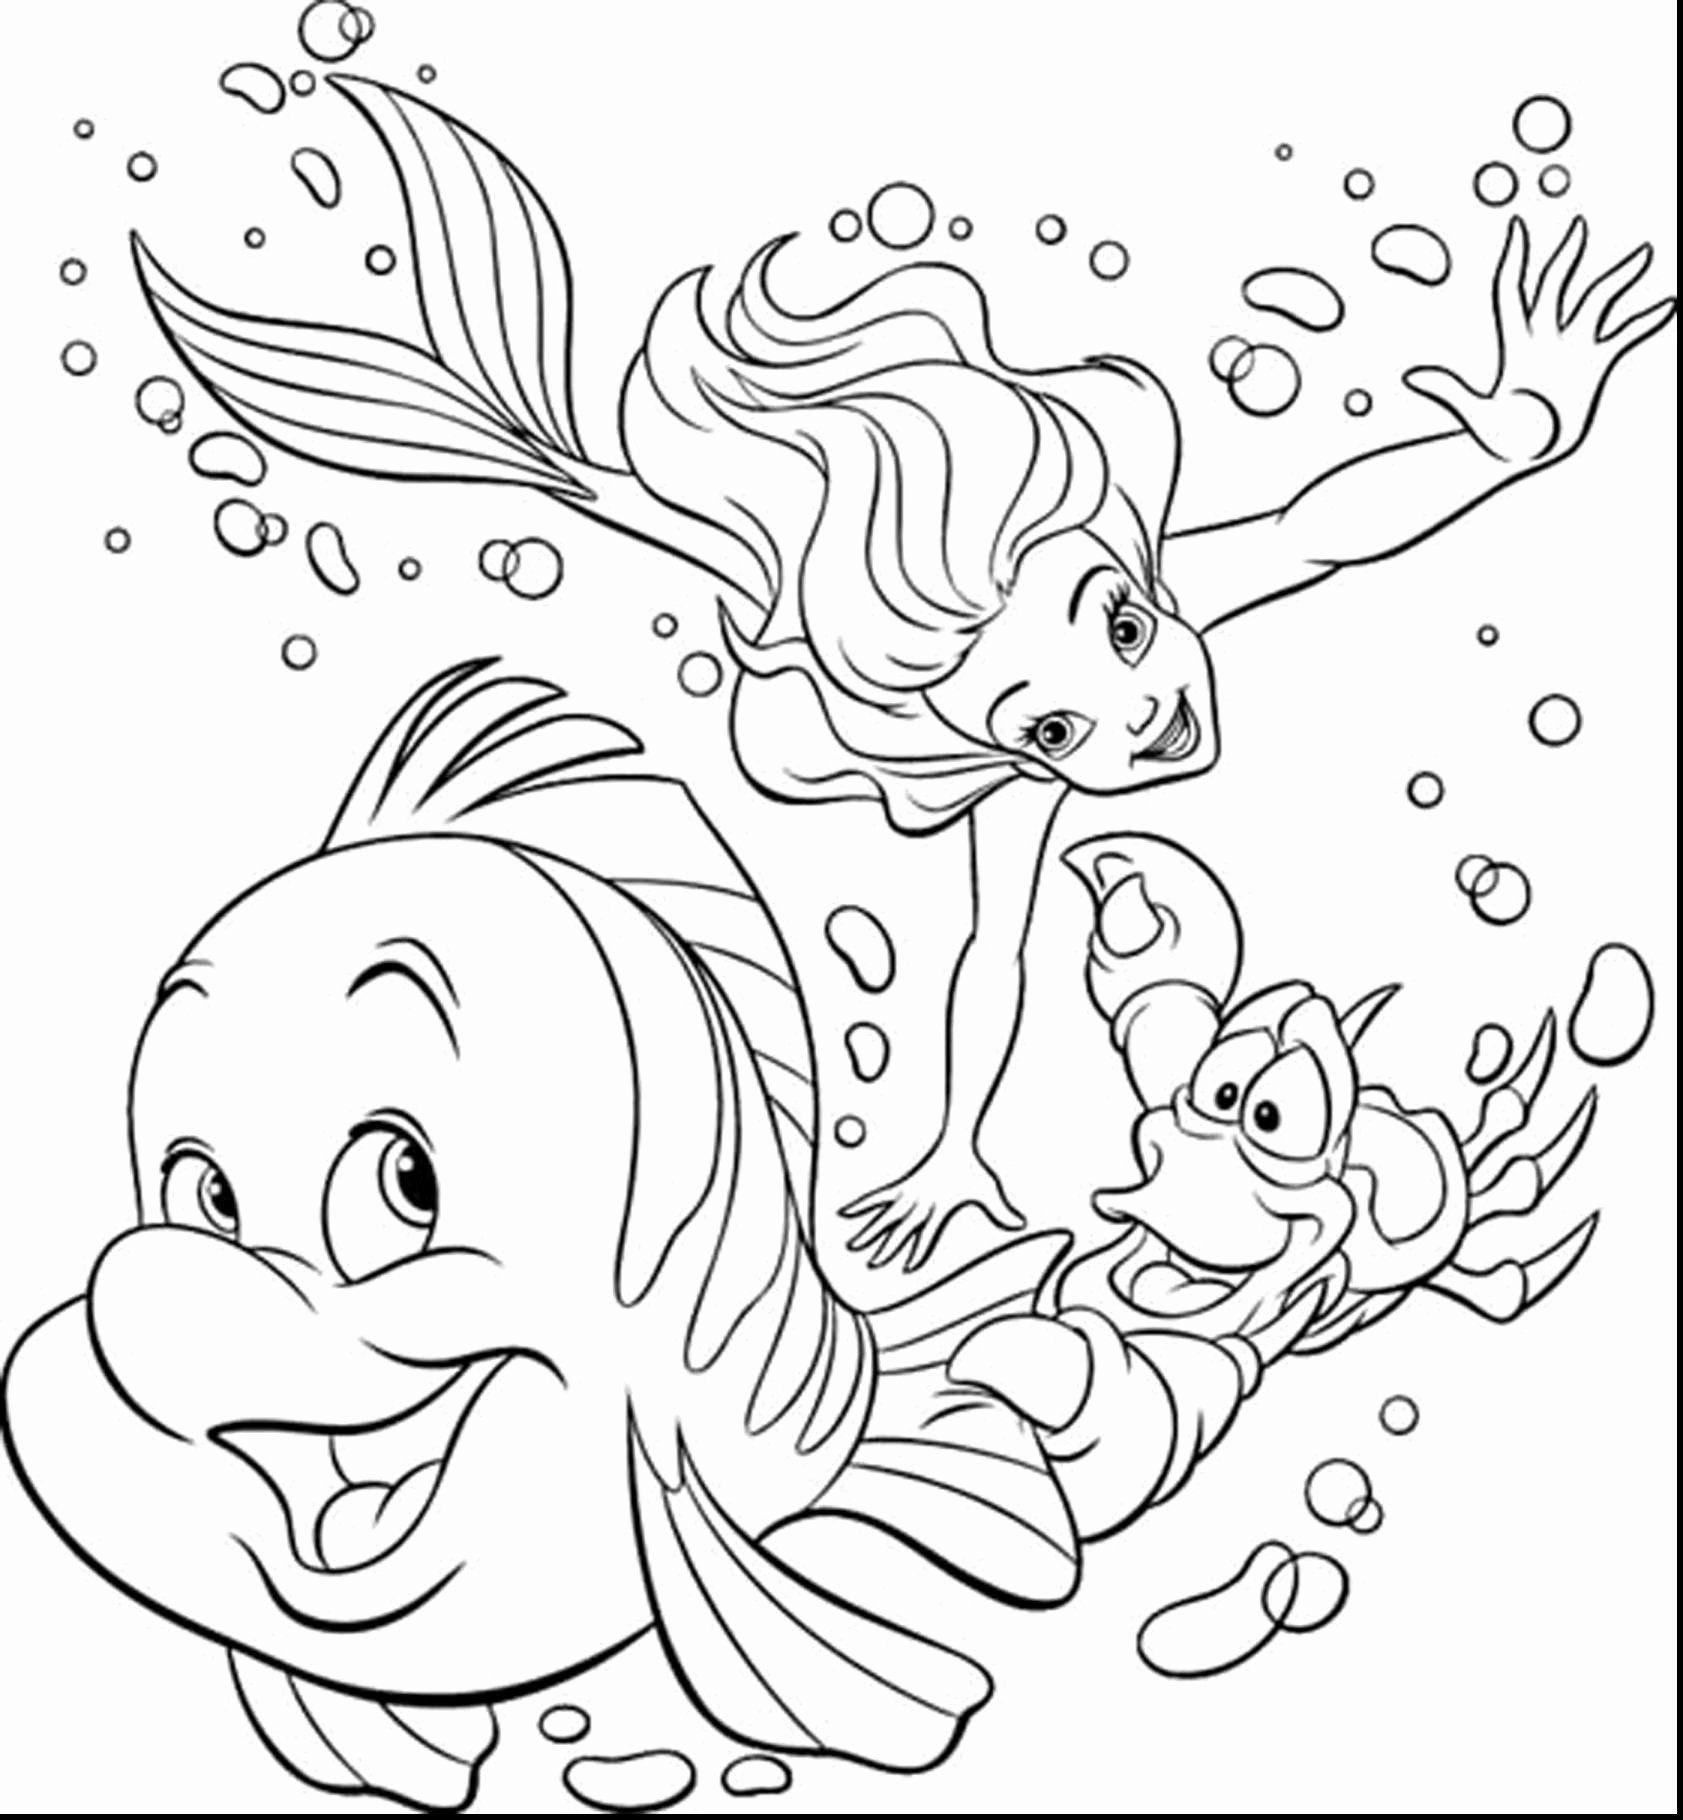 Color Up Coloring New Disney Princesses Coloring Pages Fresh 10 Barbie Outline 0d Dessin A Colorier Disney Coloriage Disney Coloriage La Petite Sirene